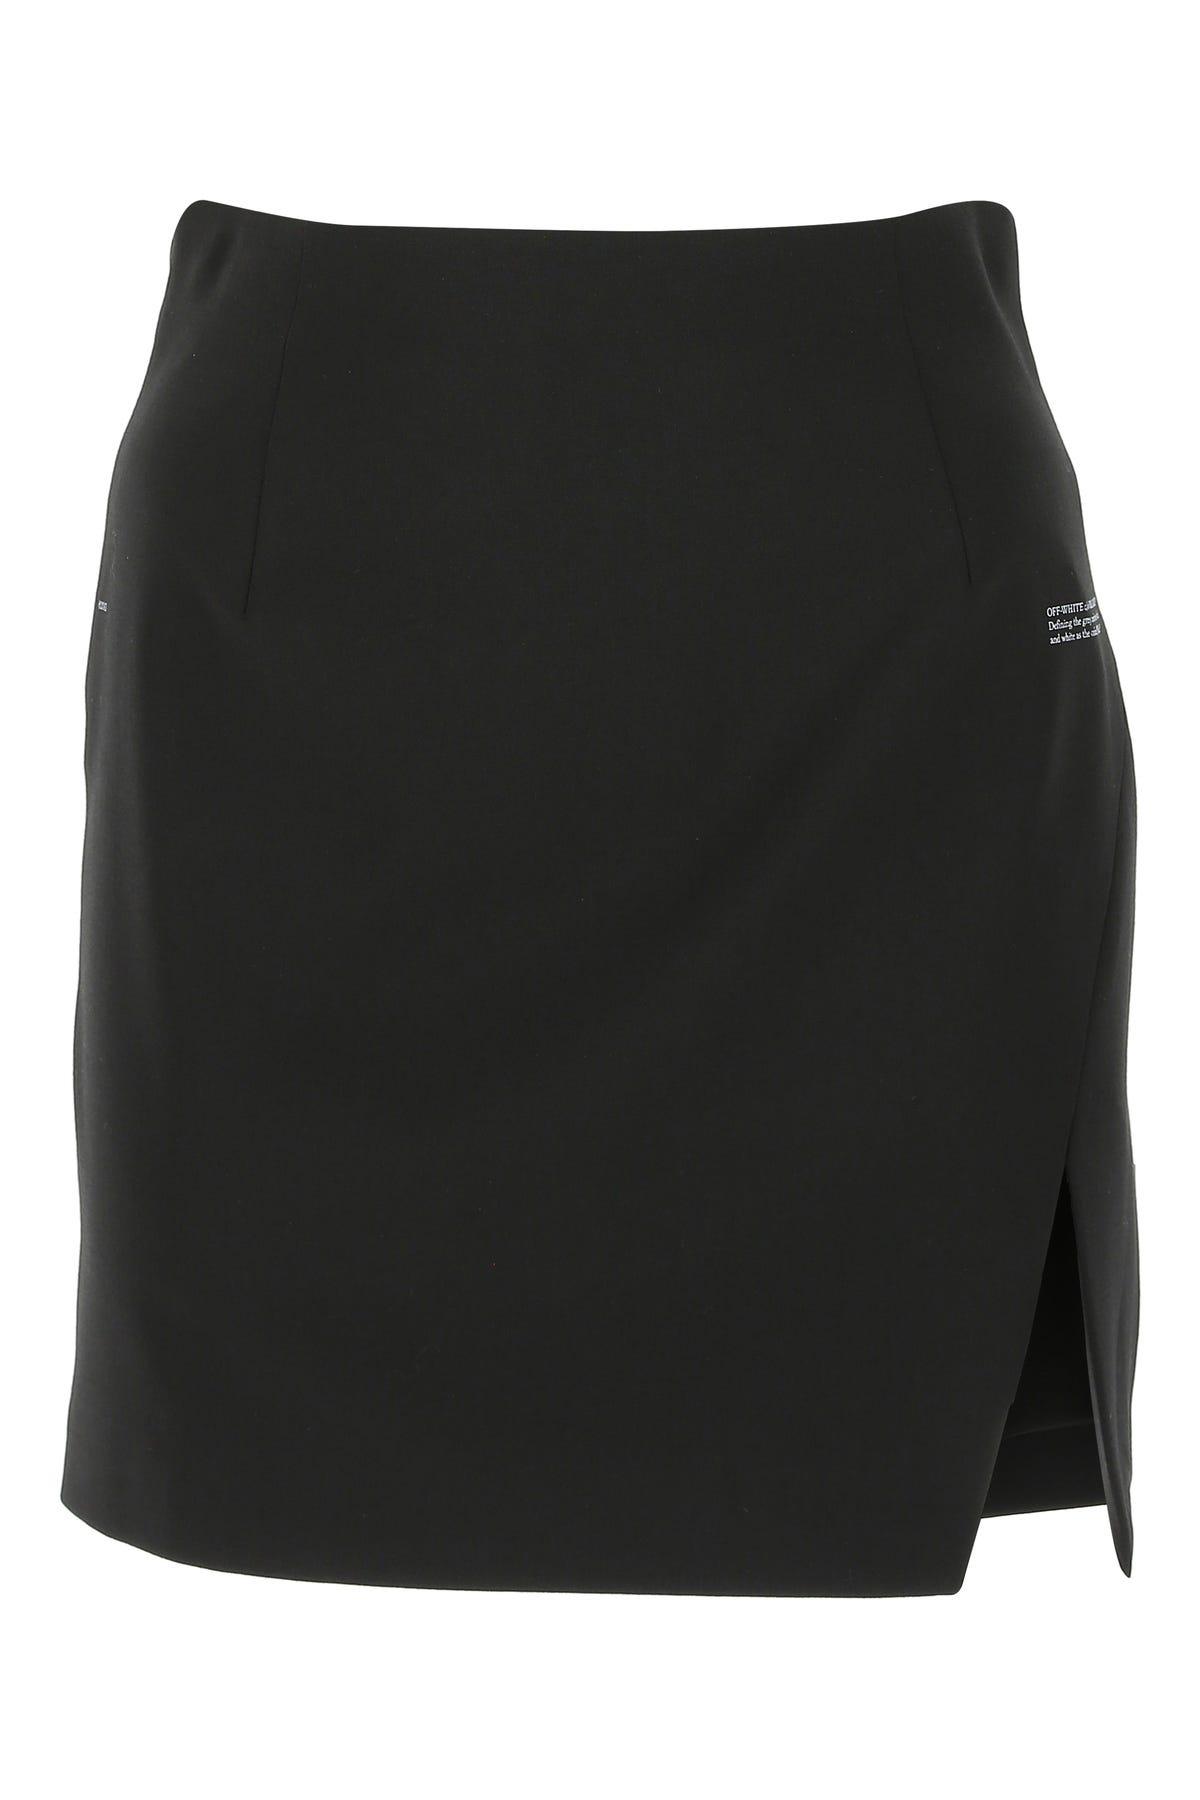 Off-white Black Stretch Polyester Blend Mini Skirt  Black Off White Donna 40